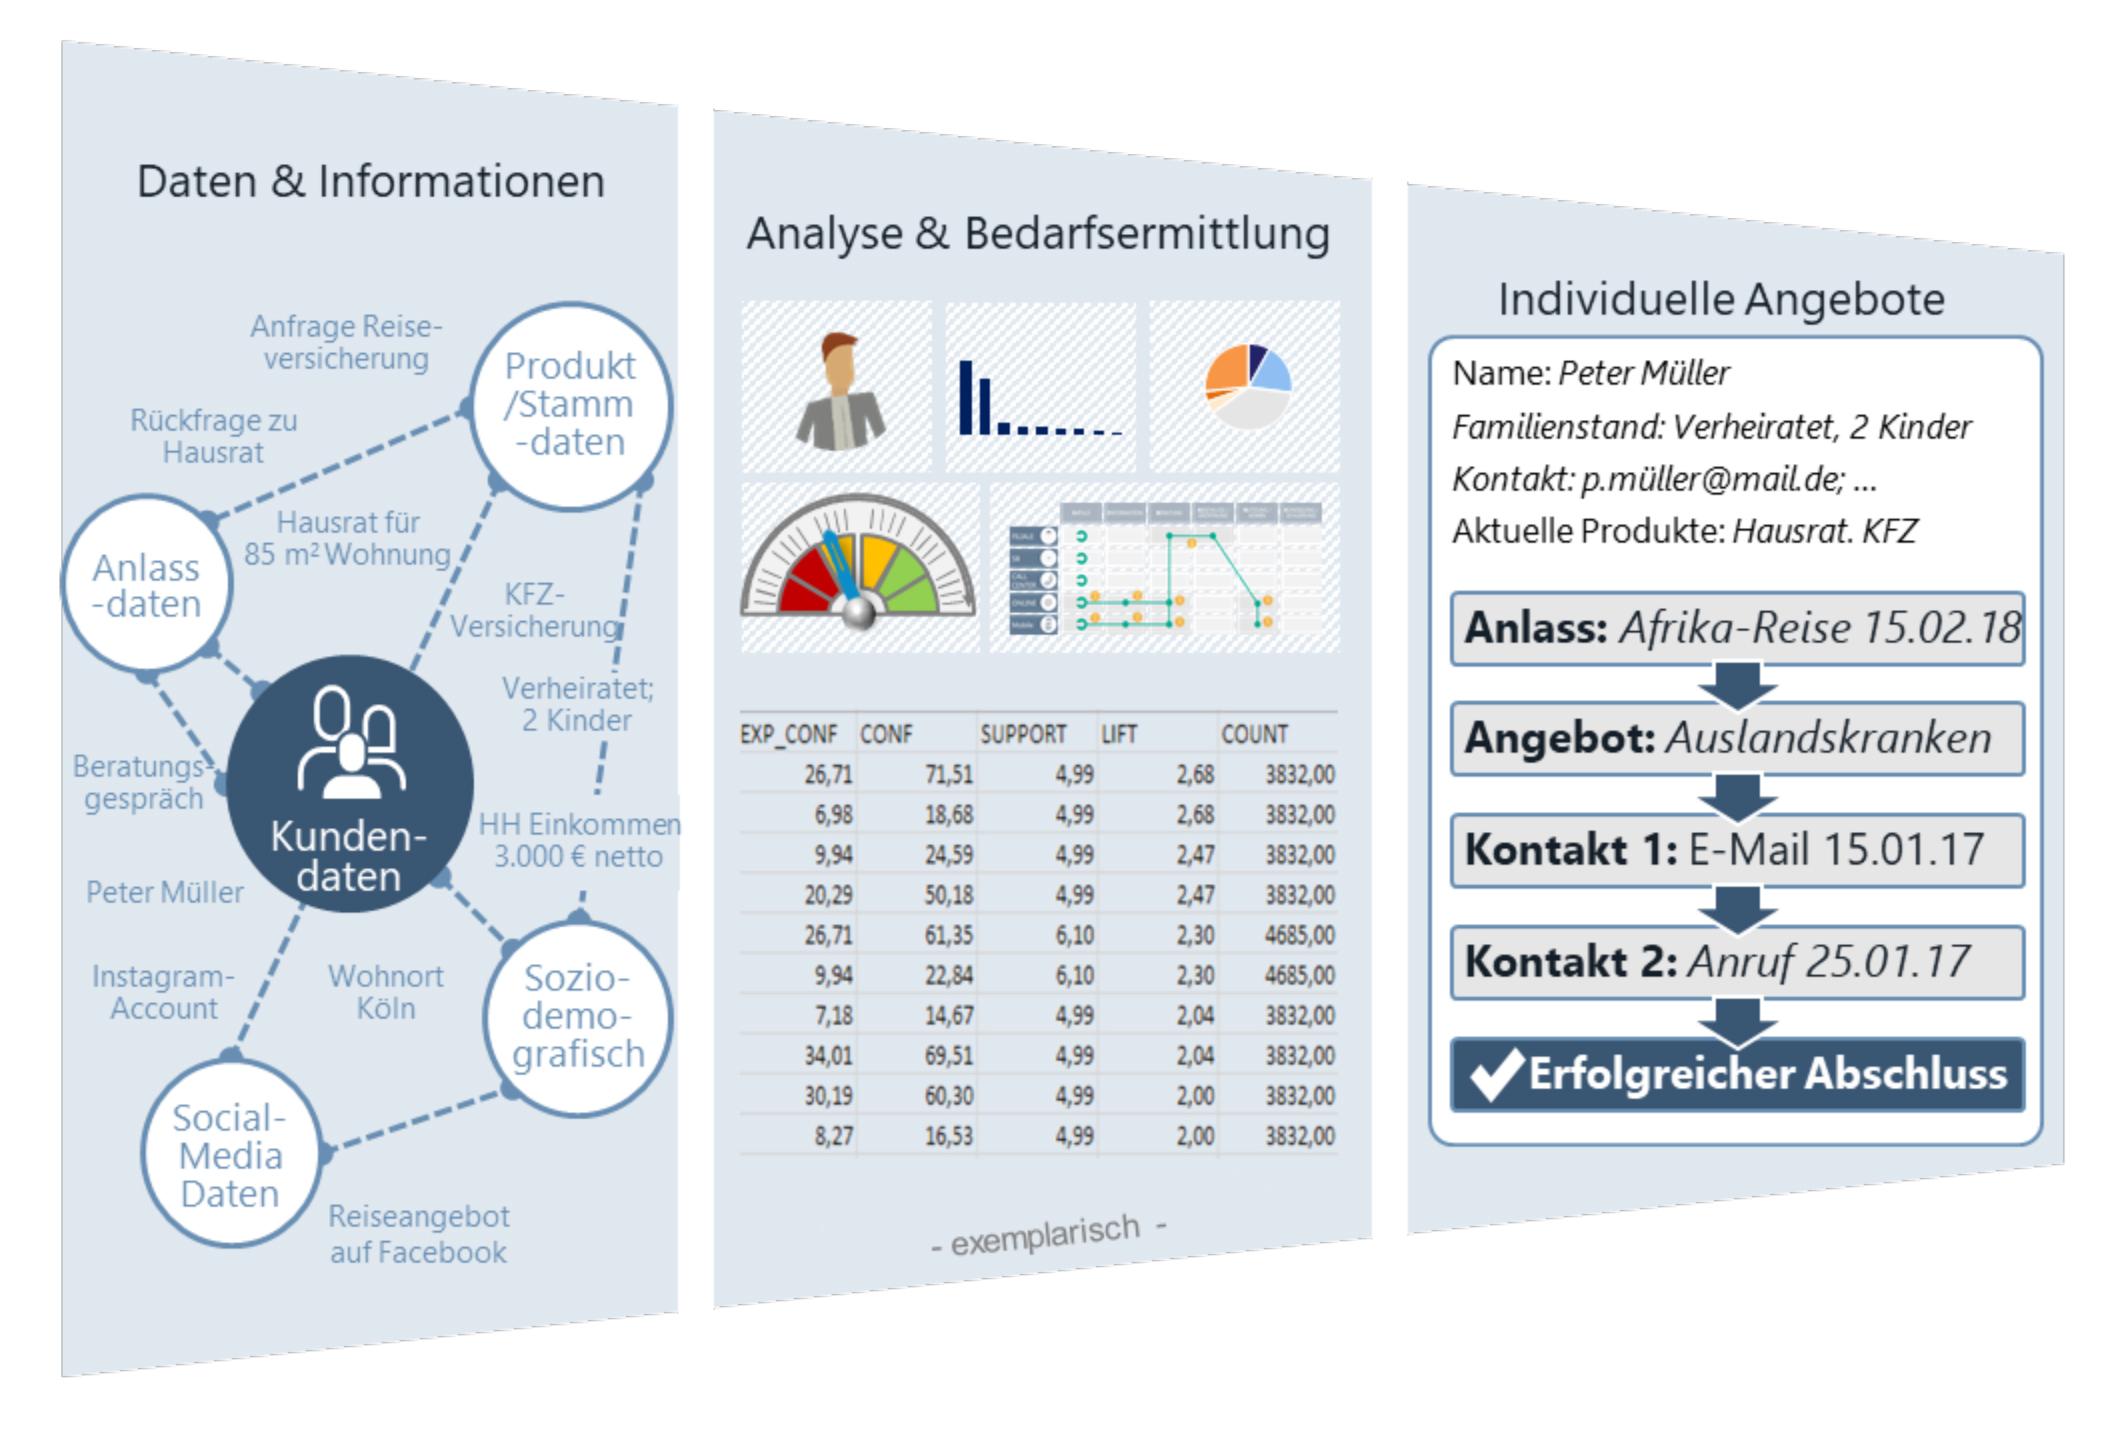 SMP Customer Analytics Vertriebsimpulse